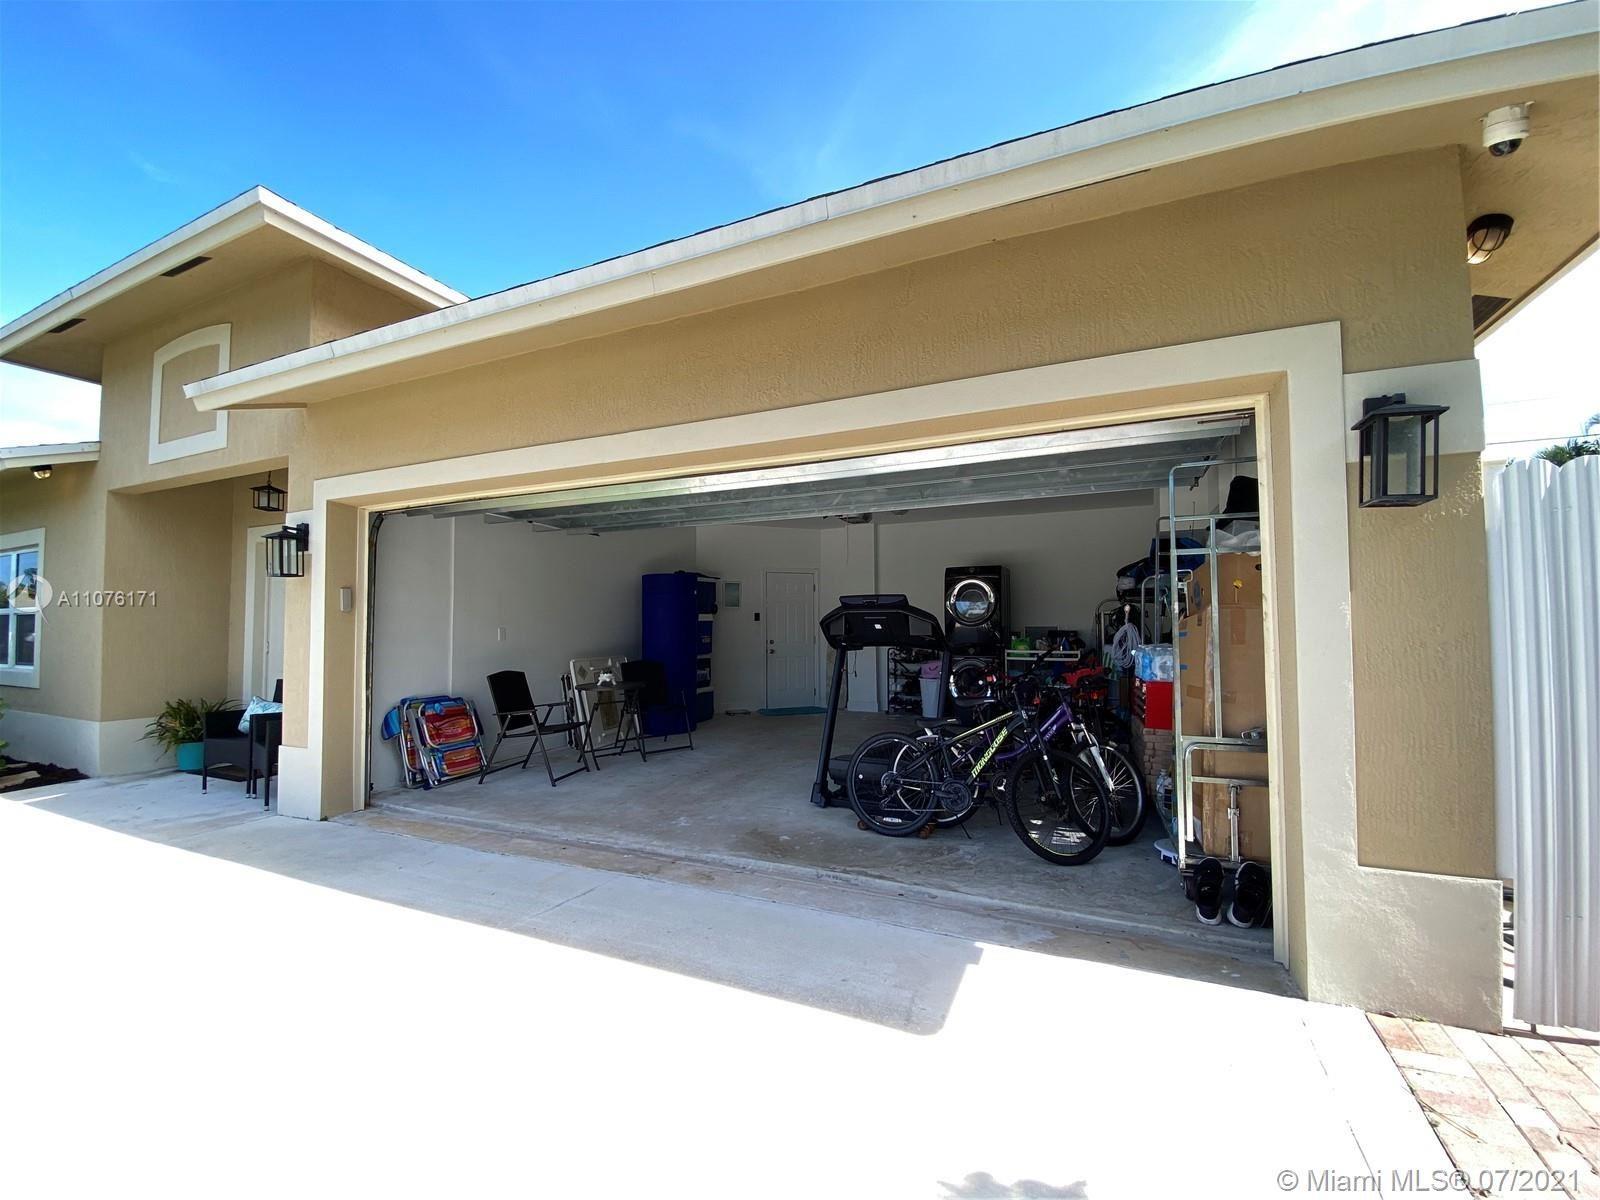 Photo of 1548 NE 31st Ct, Pompano Beach, FL 33064 (MLS # A11076171)